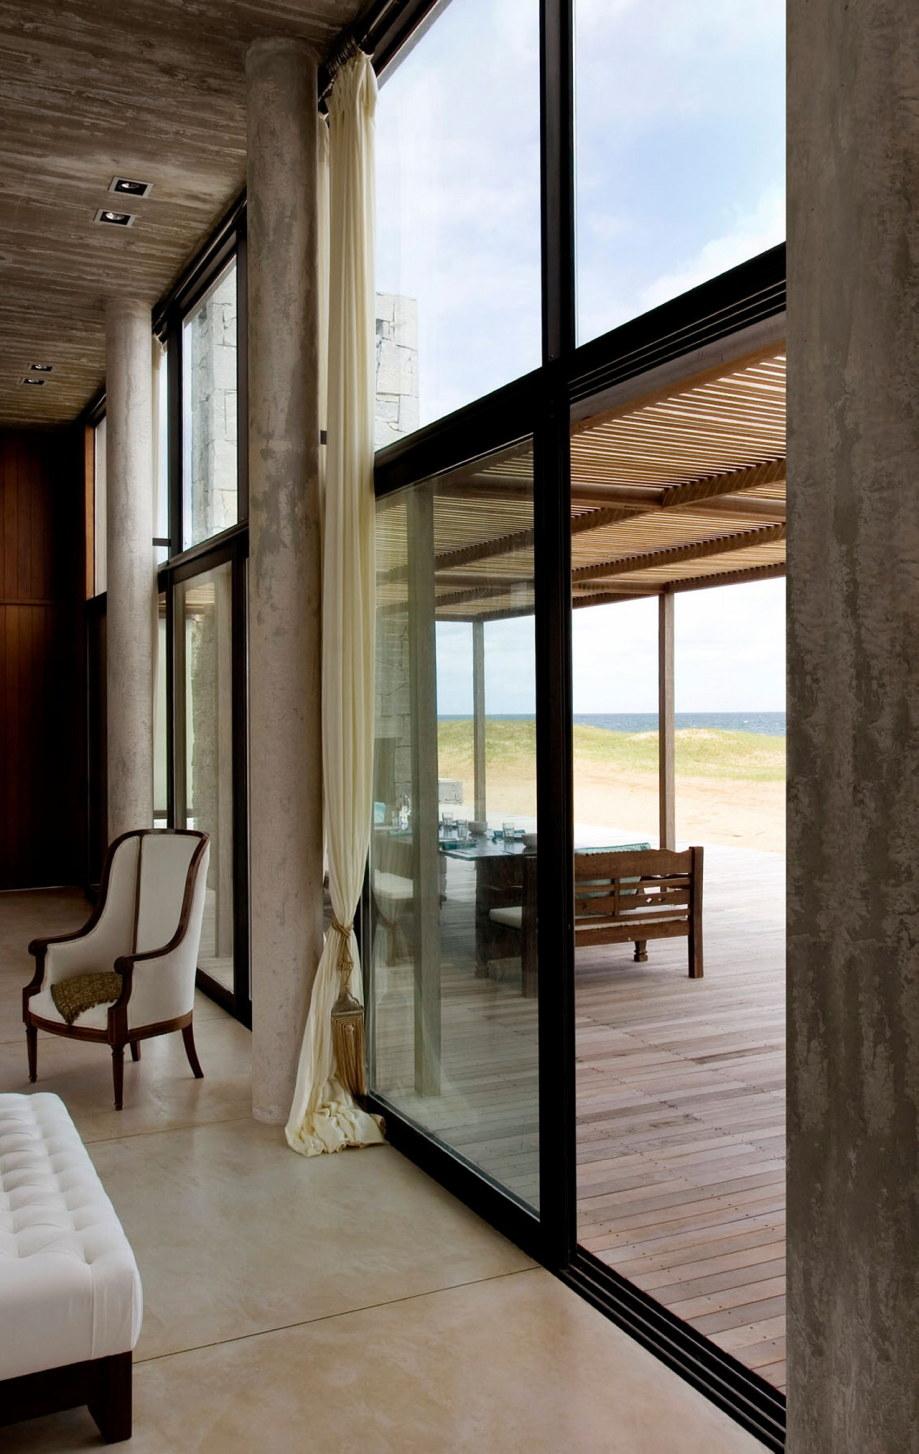 The beach house La Boyita Residence by Martin Gomez Arguitectos, Uruguay 18